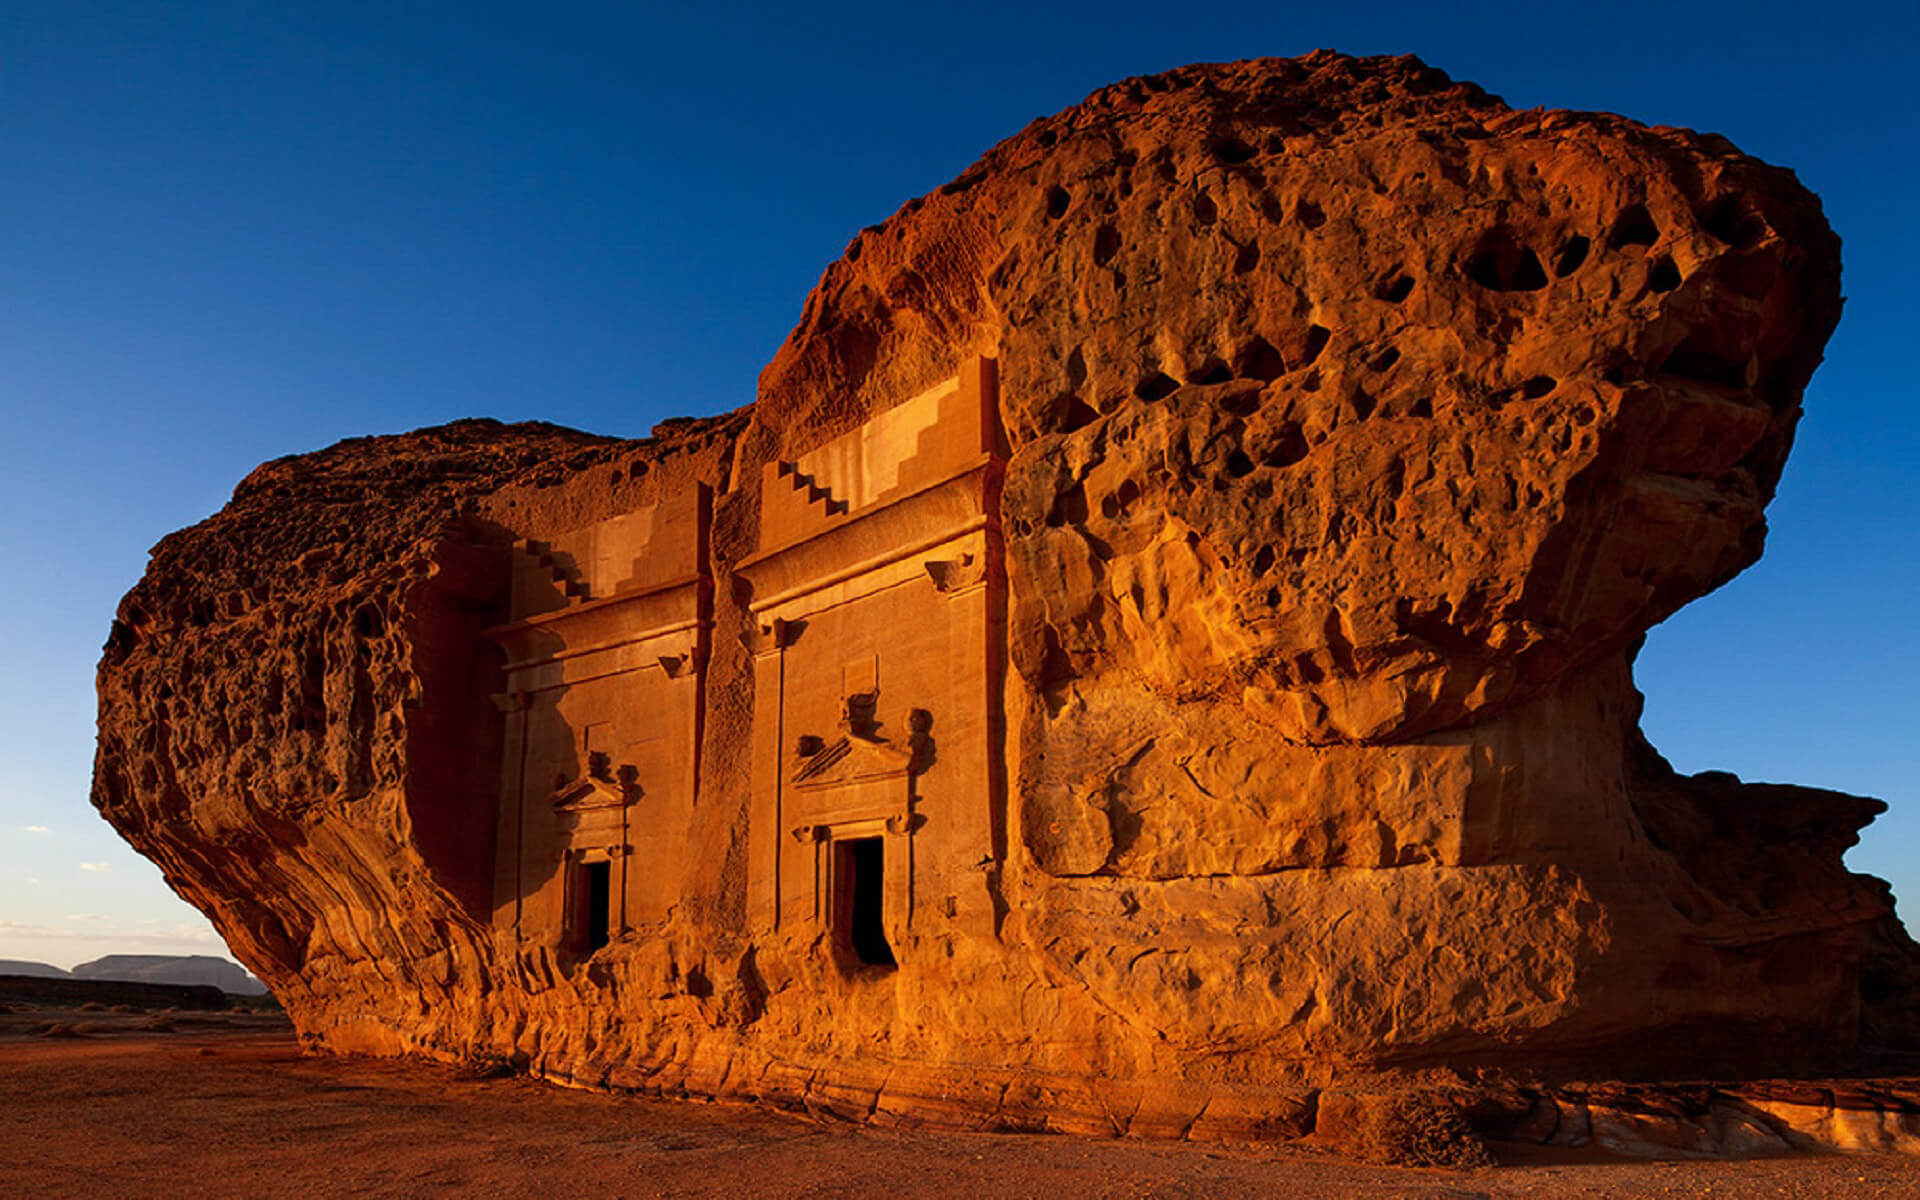 Lonely Castle, Saudi Arabia